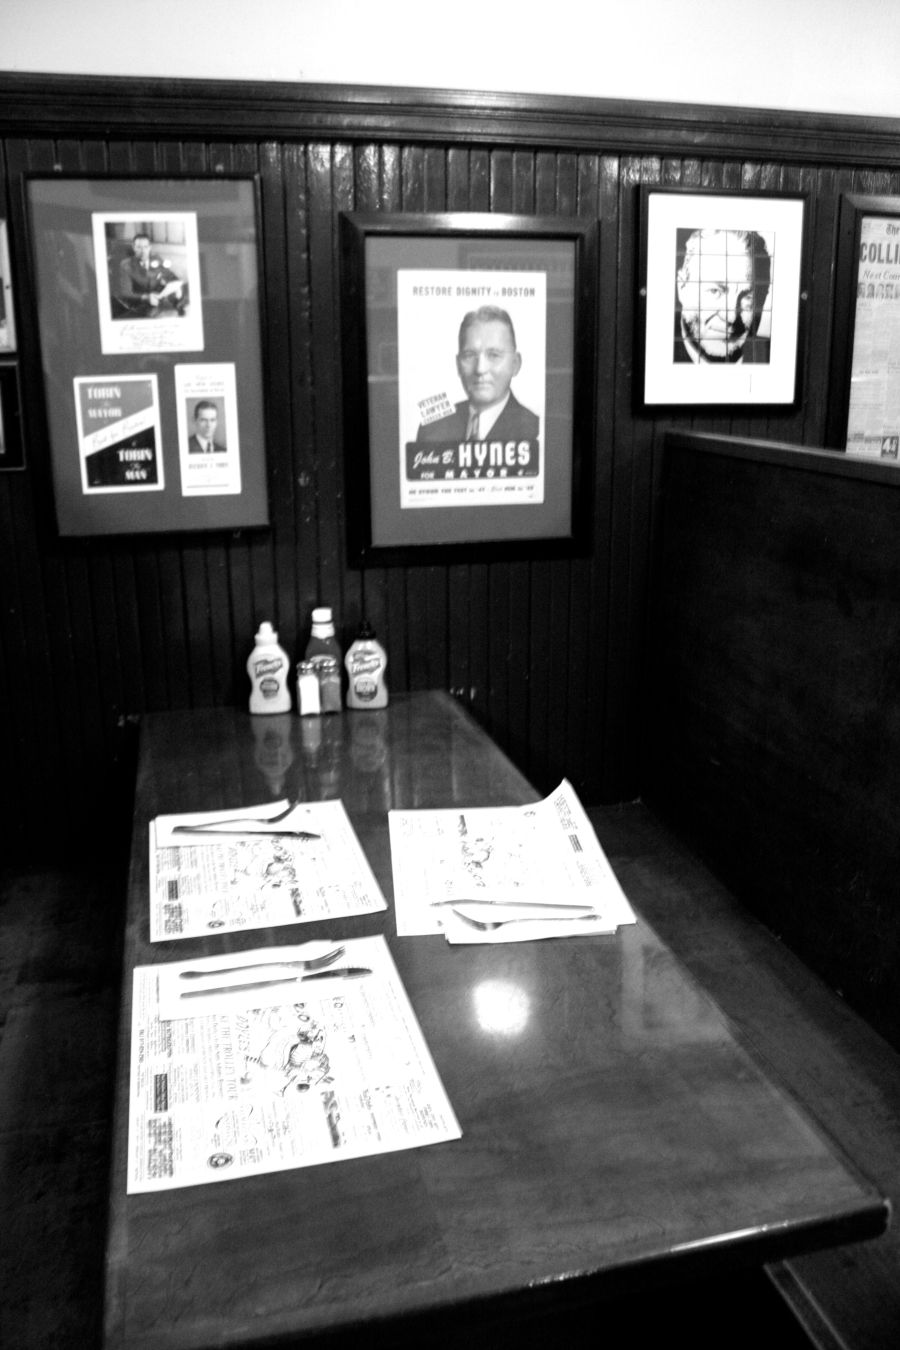 boston jamaica plain doyles cafe 4